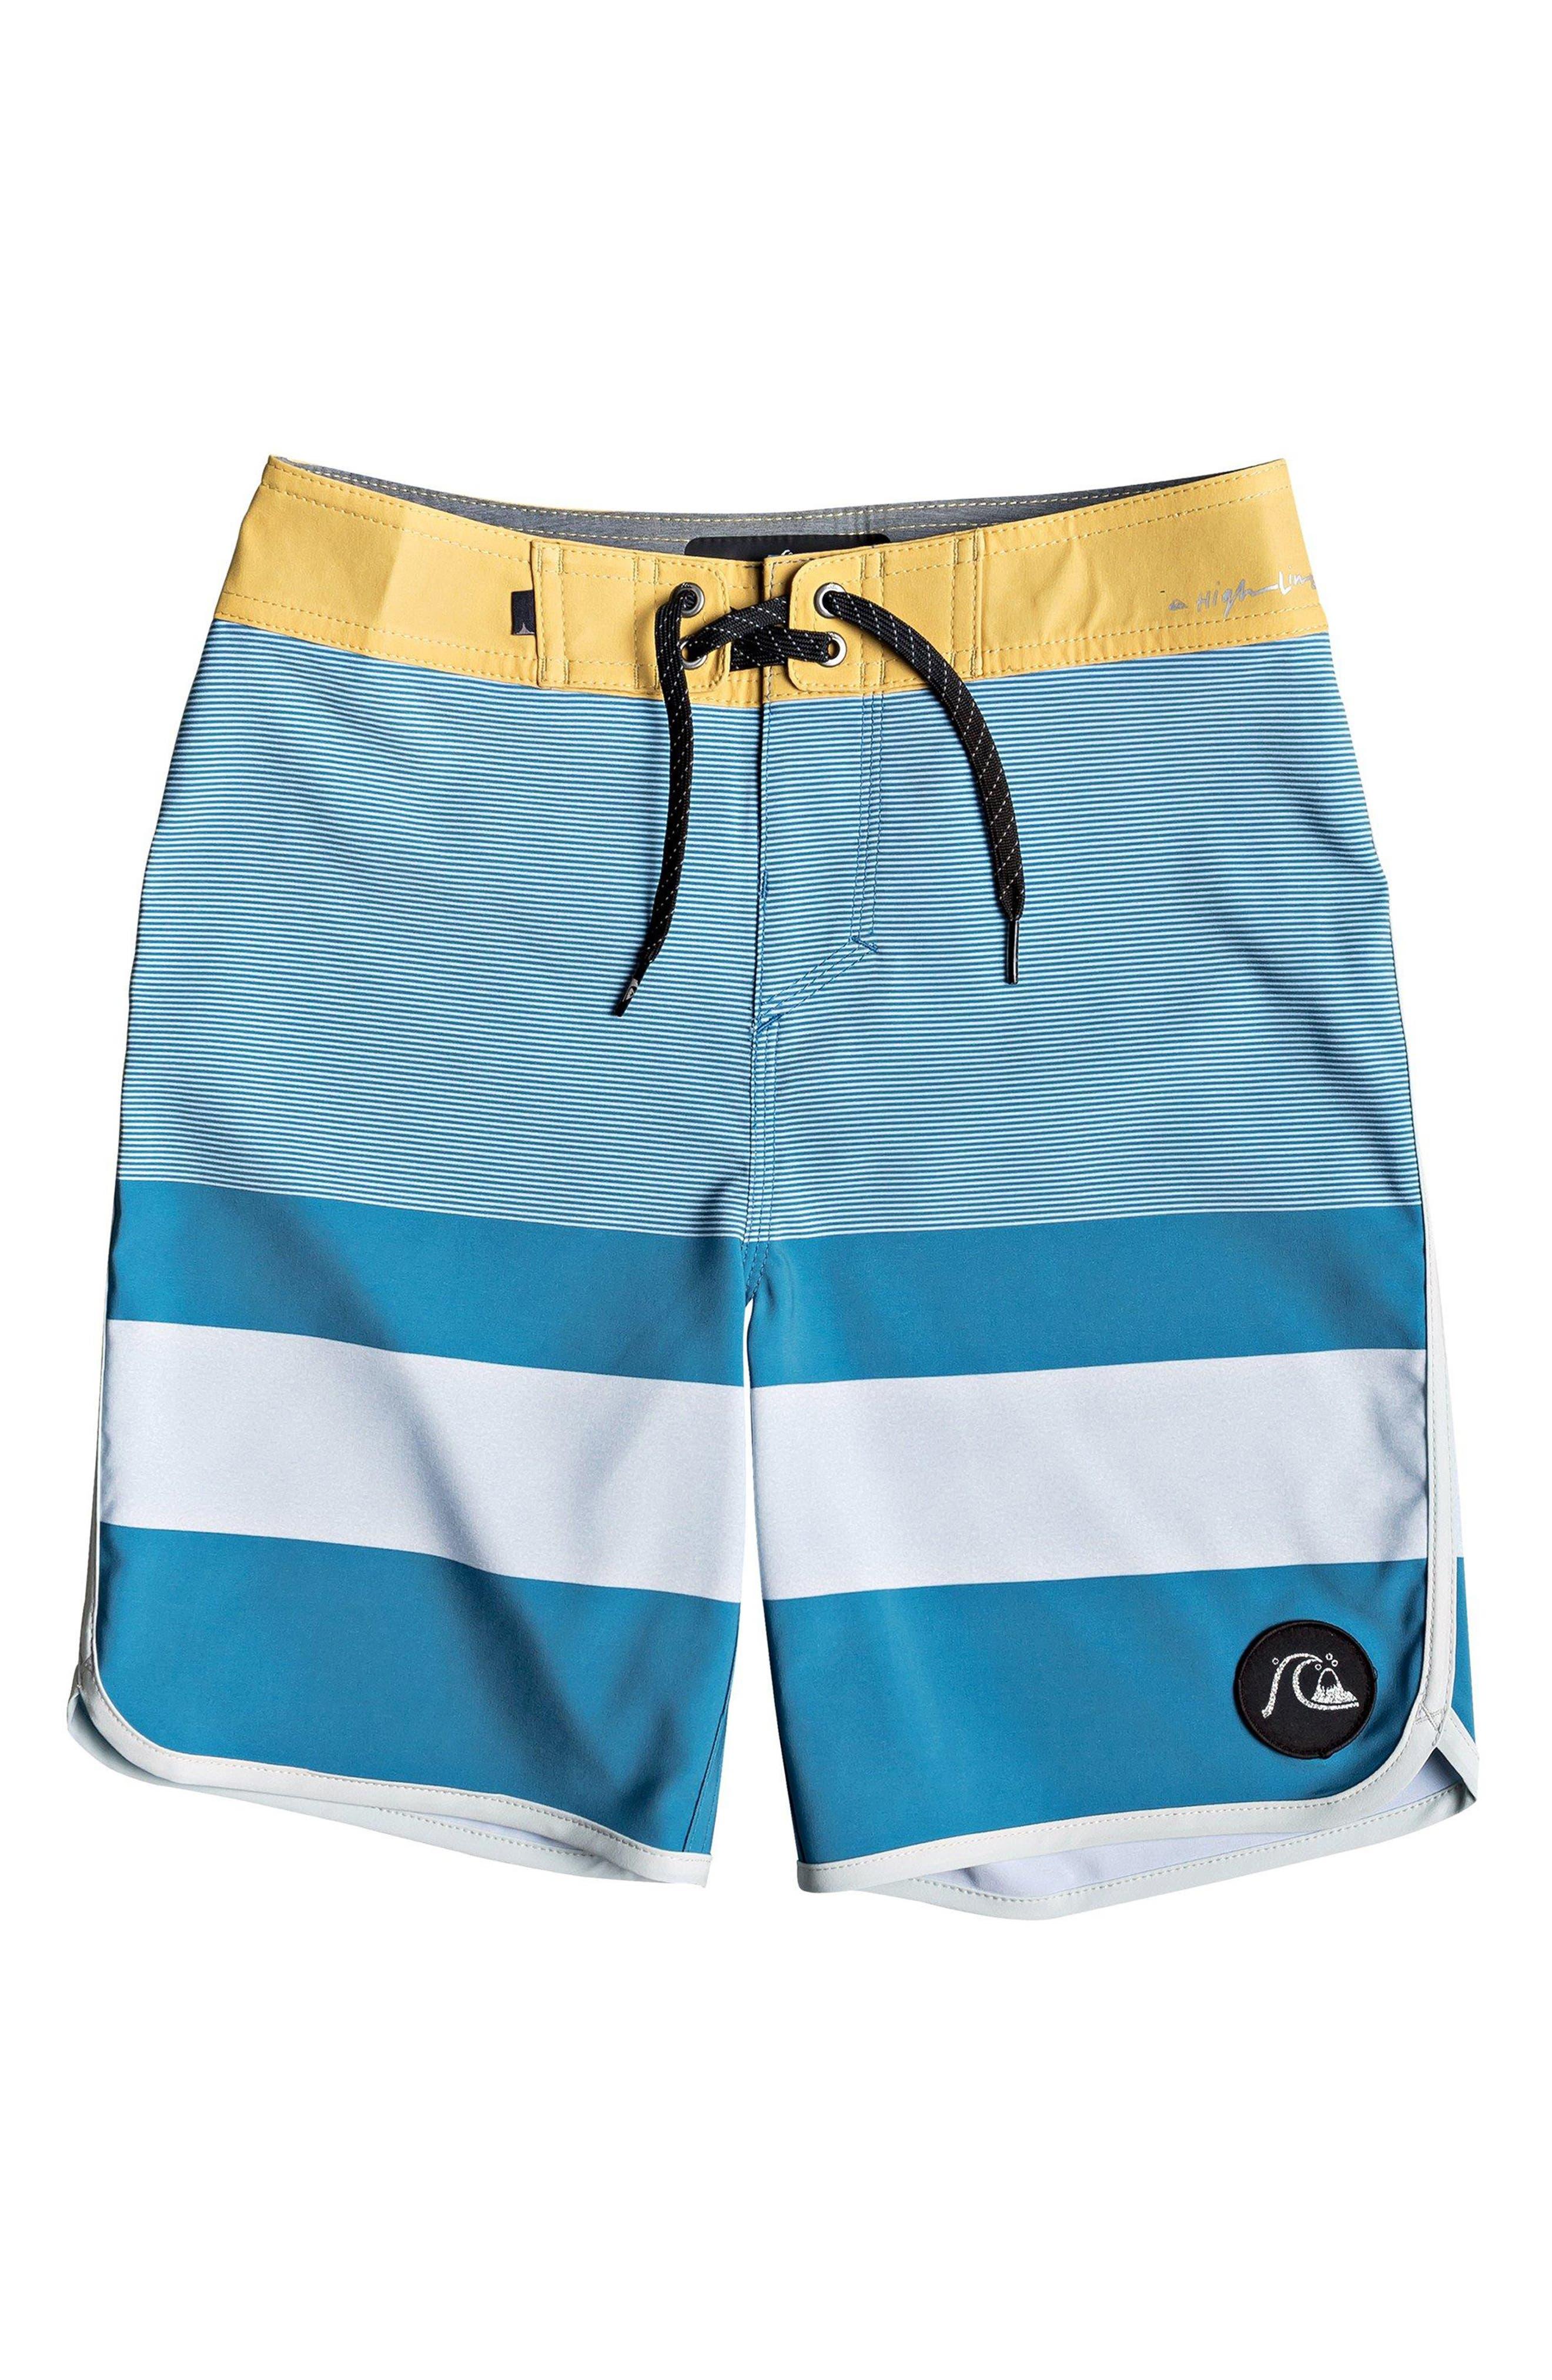 QUIKSILVER, Highline Tijuana Board Shorts, Main thumbnail 1, color, SOUTHERN OCEAN